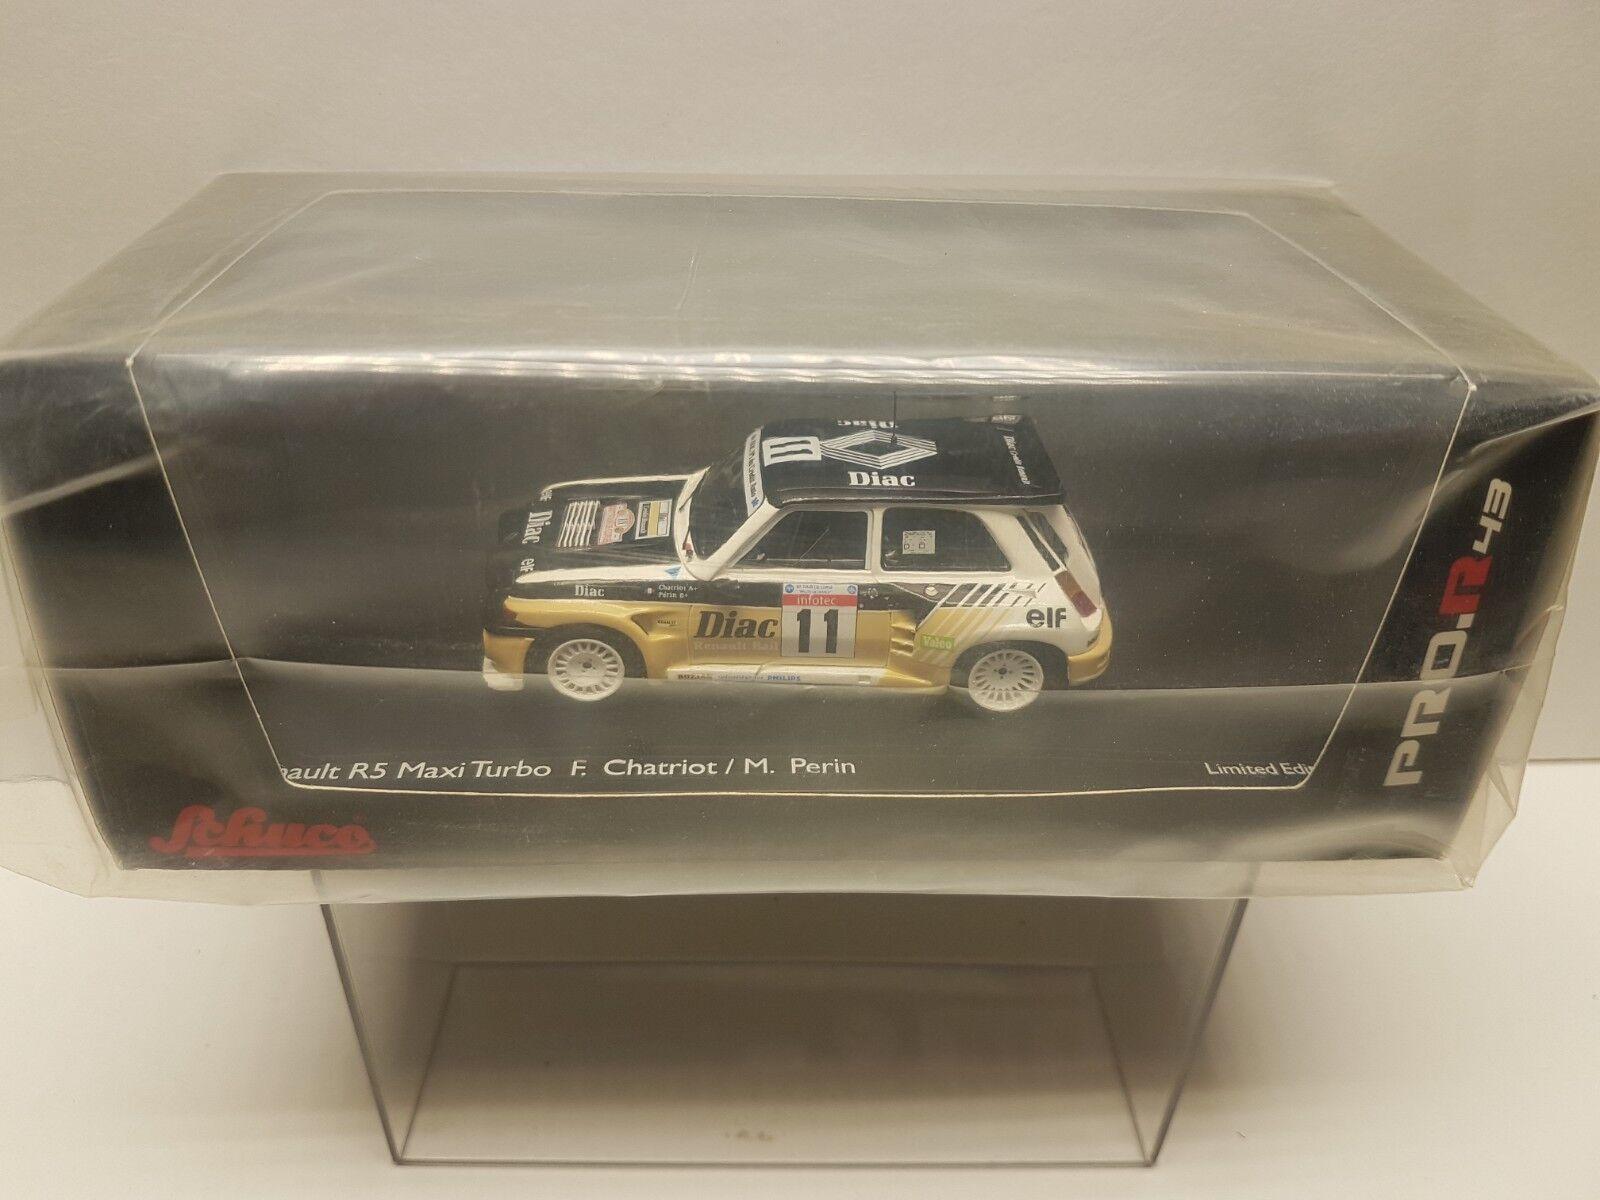 Renault 5 Maxi Turbo Tour de Corse F.Chatriot M.Perrin Schucco 450885200